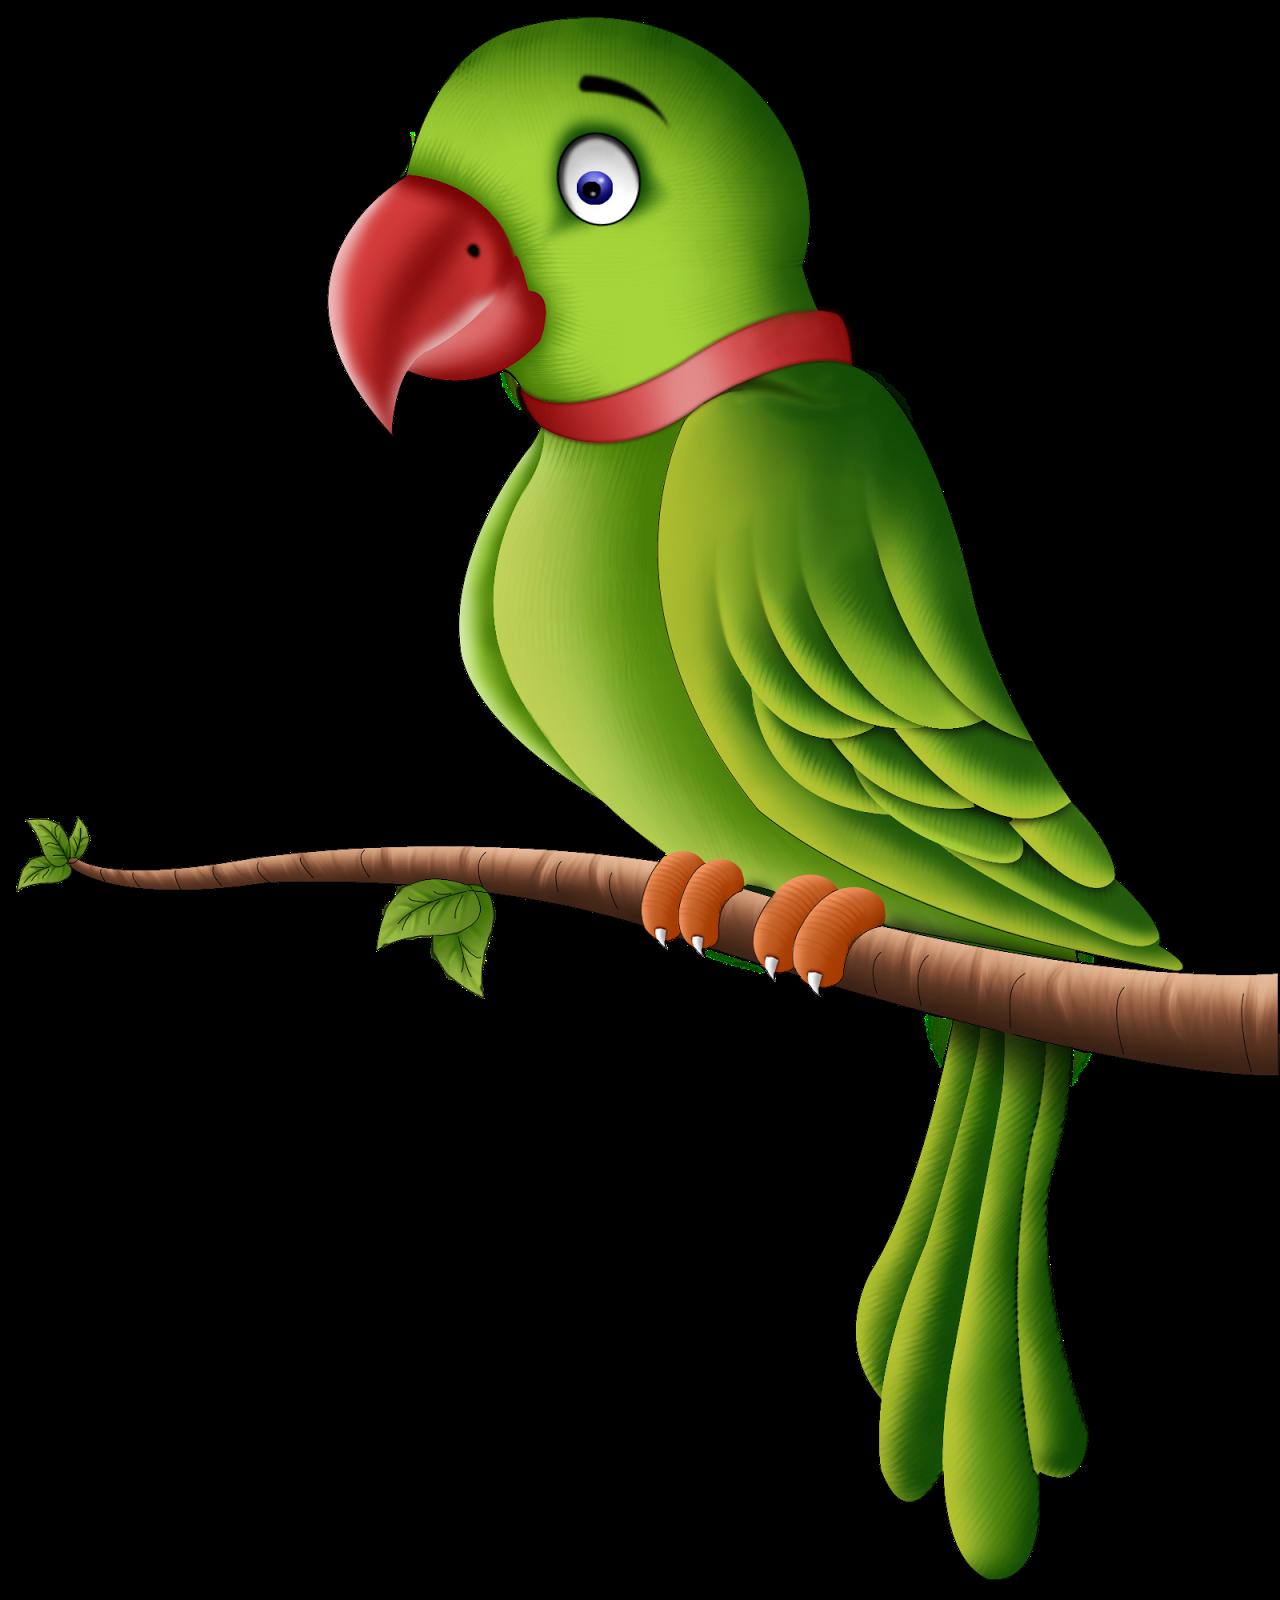 Parrot clipart perico. Bird clip art transprent